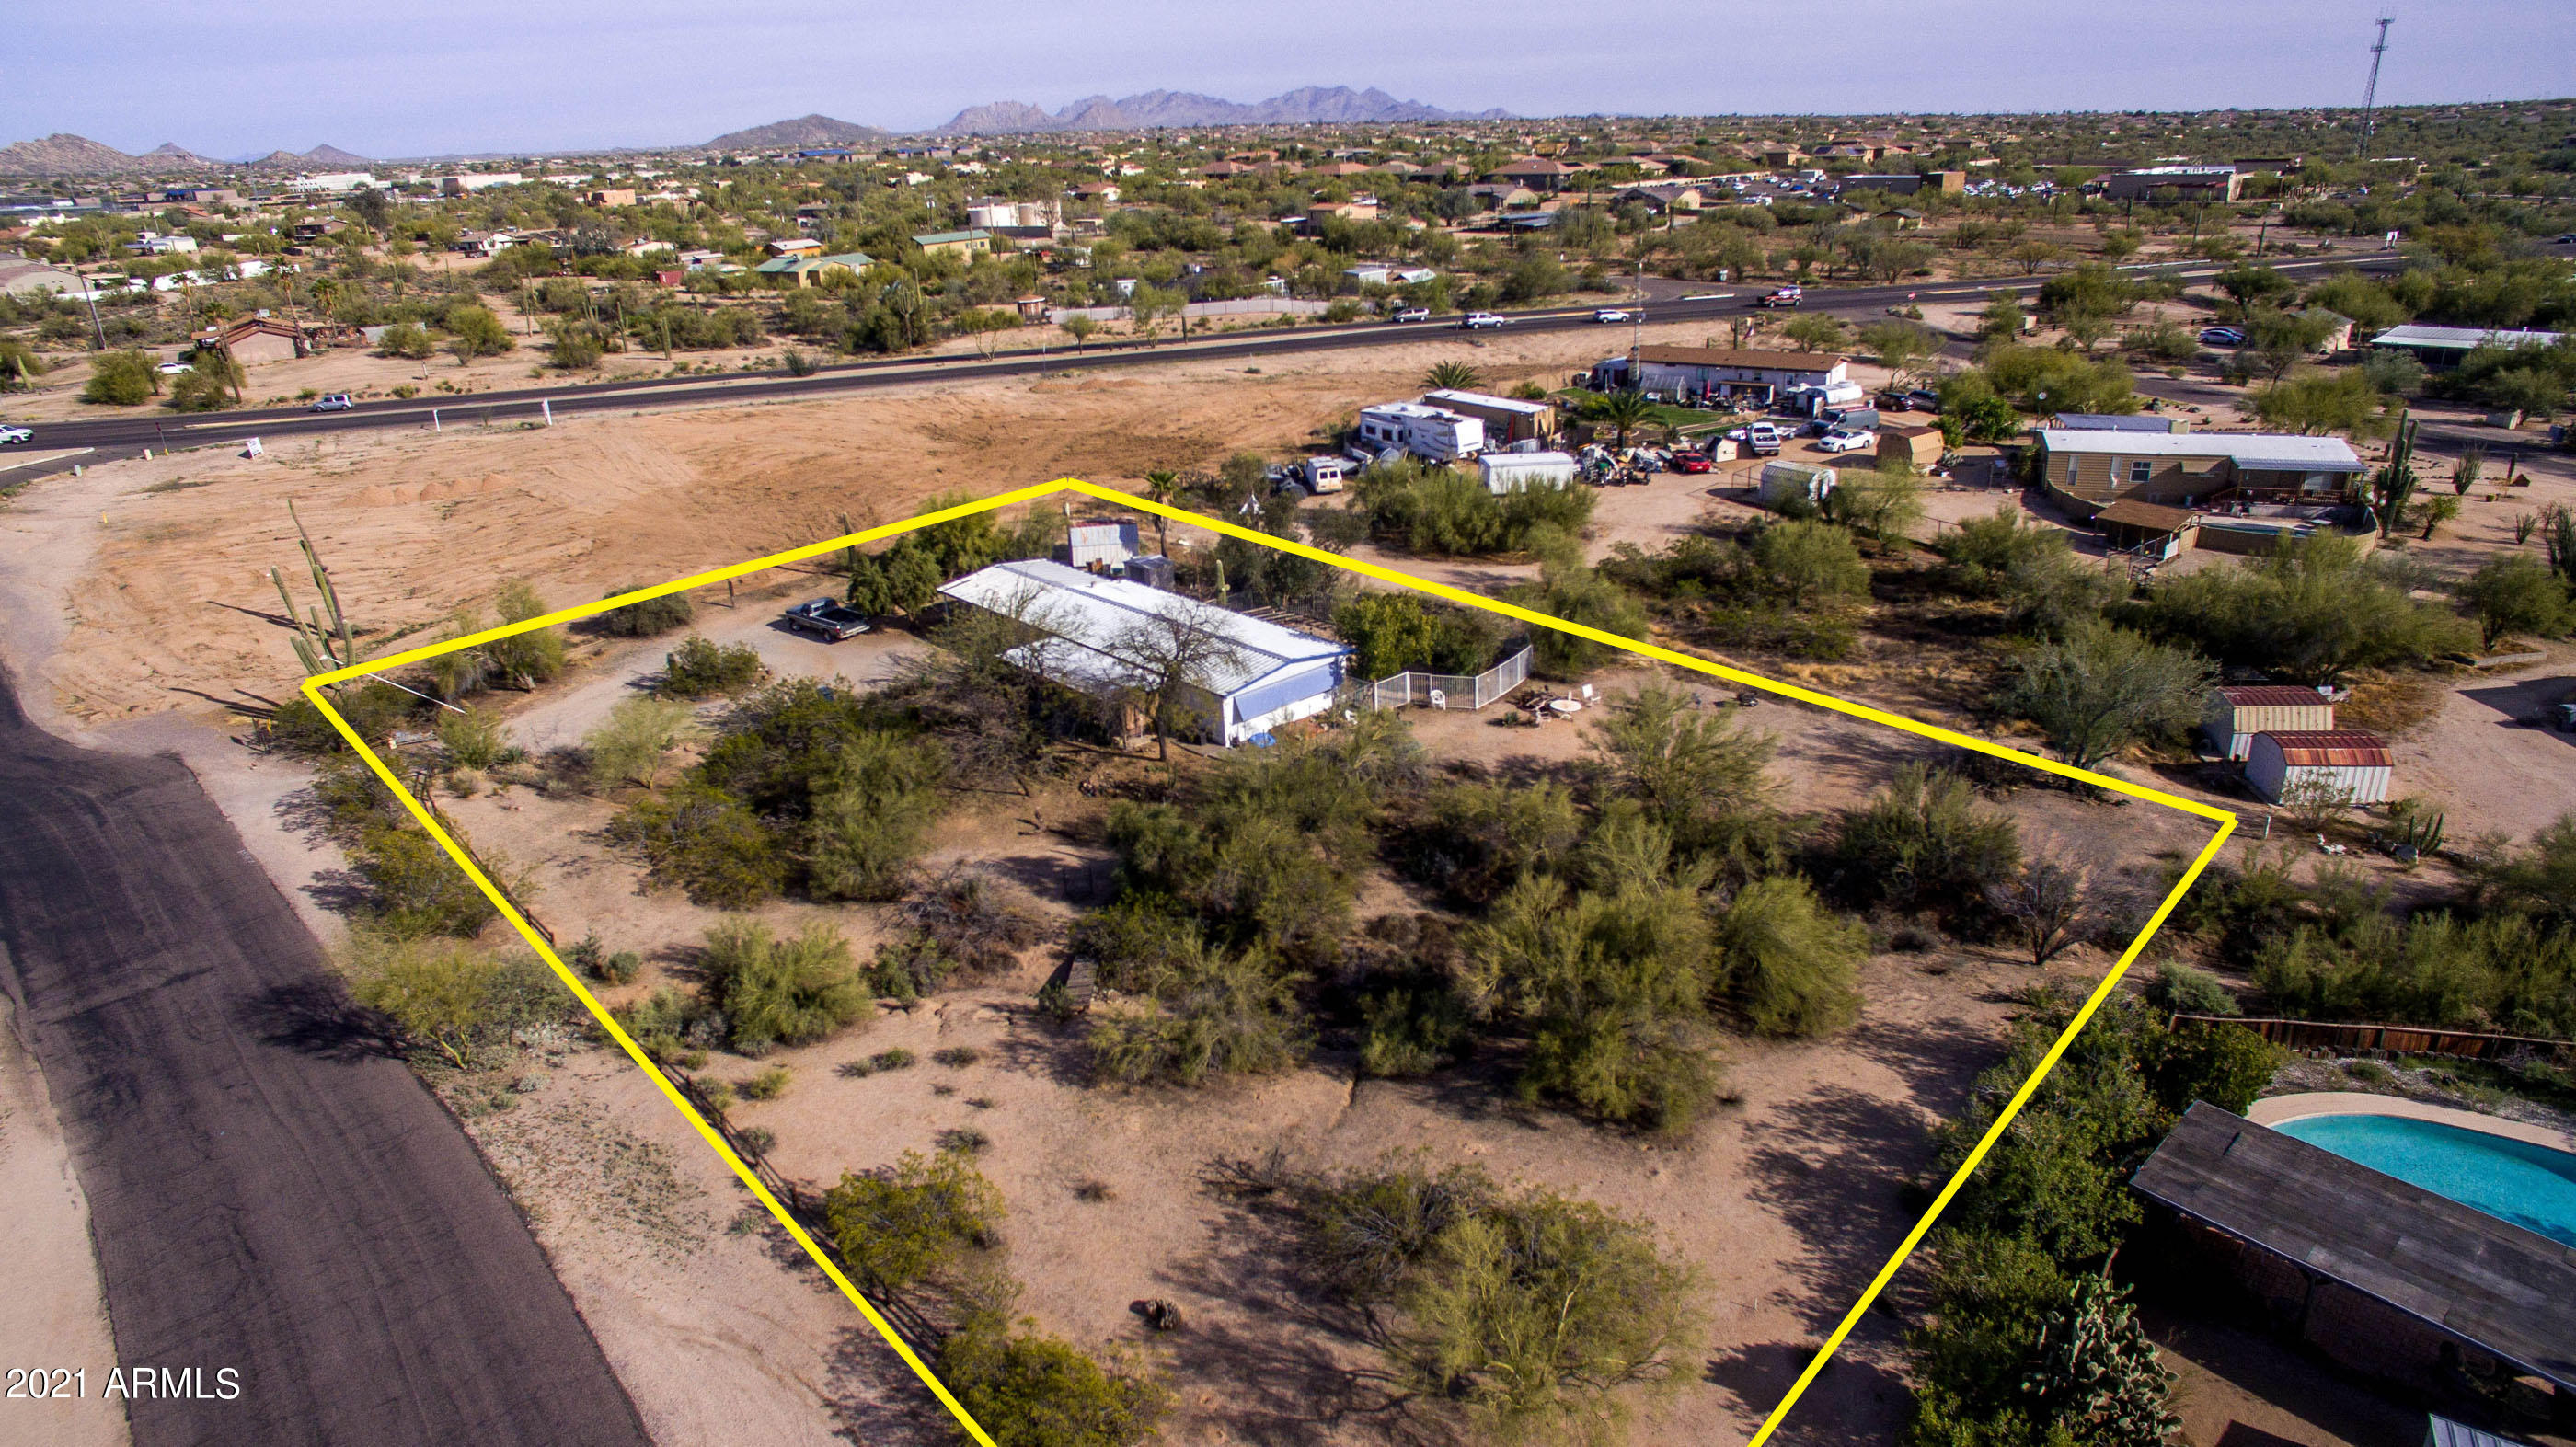 5141 E Westland Road # 1, Cave Creek, AZ 85331, ,Land,For Sale,5141 E Westland Road # 1,6215457